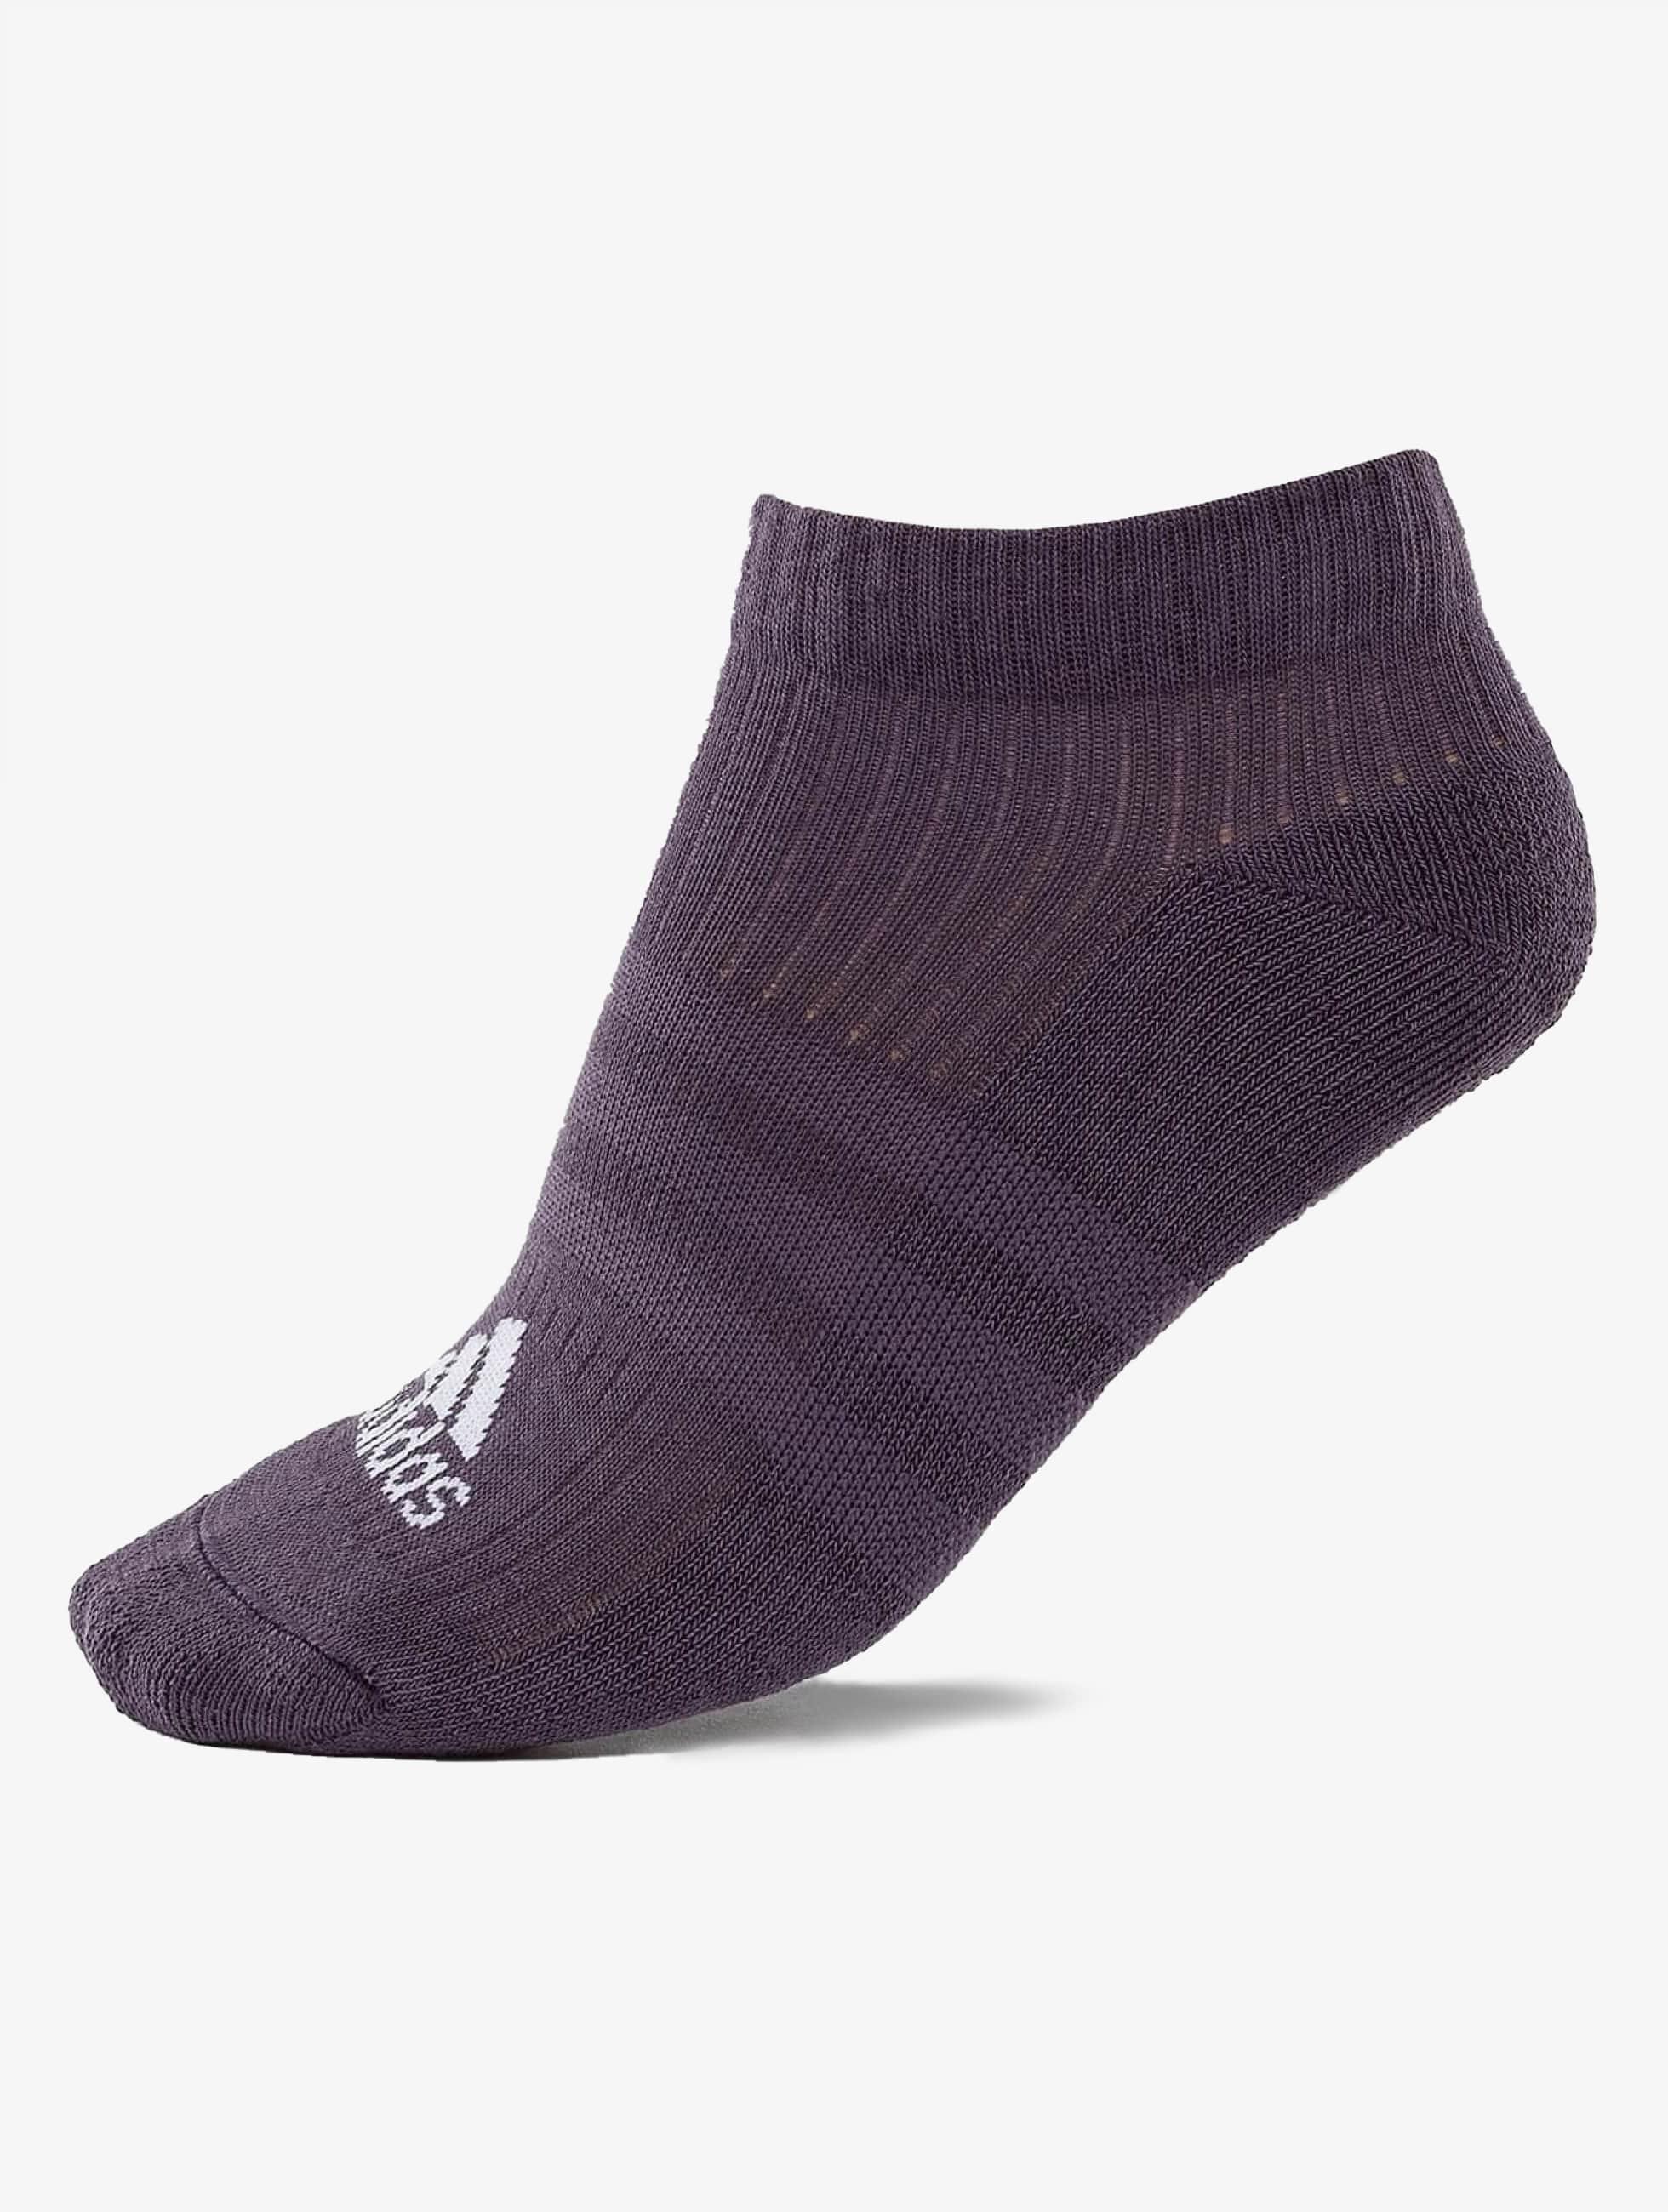 adidas Skarpetki 3-Stripes Per n-s HS 3-Pairs pink